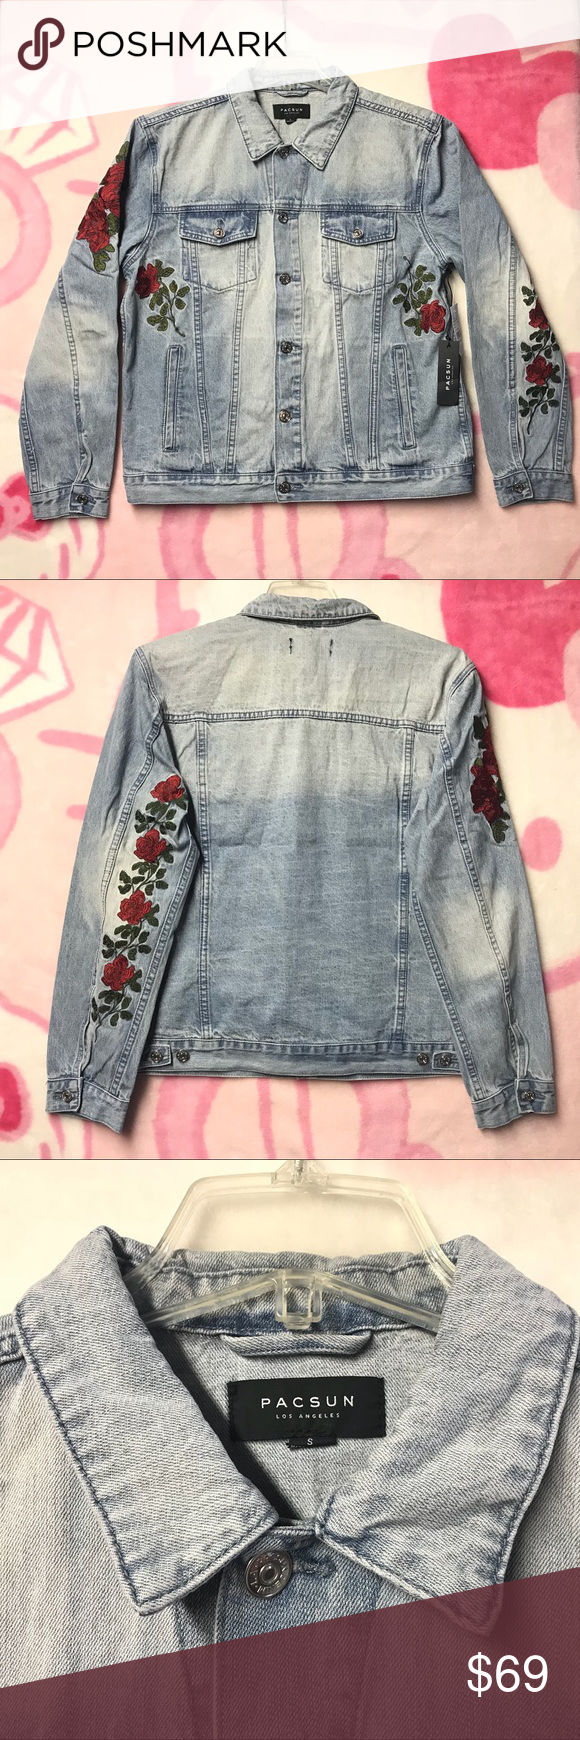 New Pacsun Roses Mens Denim Jacket Size Small Nwt My Posh Picks